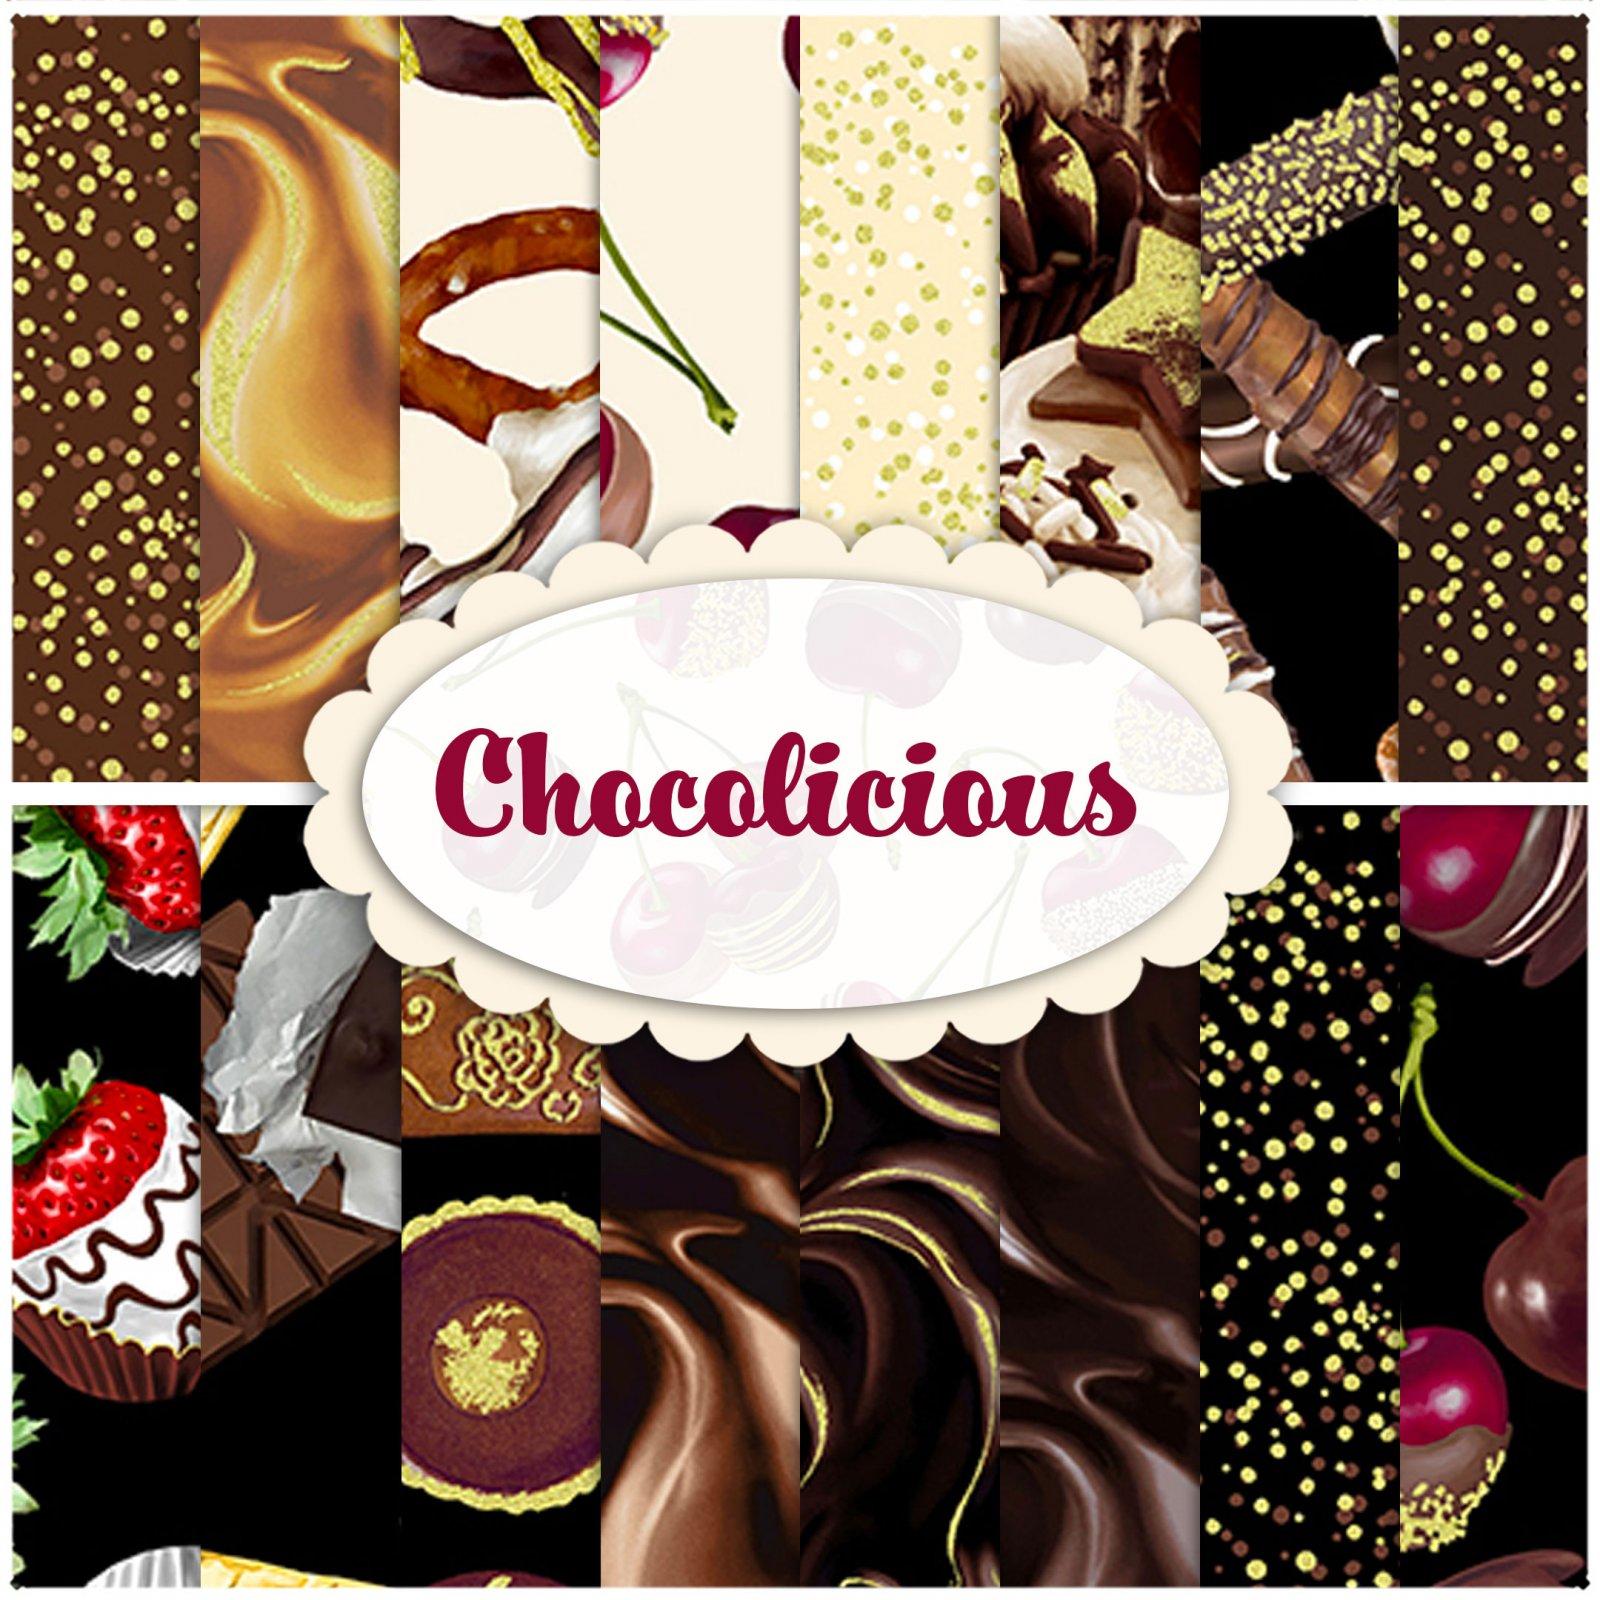 Chocolicious by Kanvas